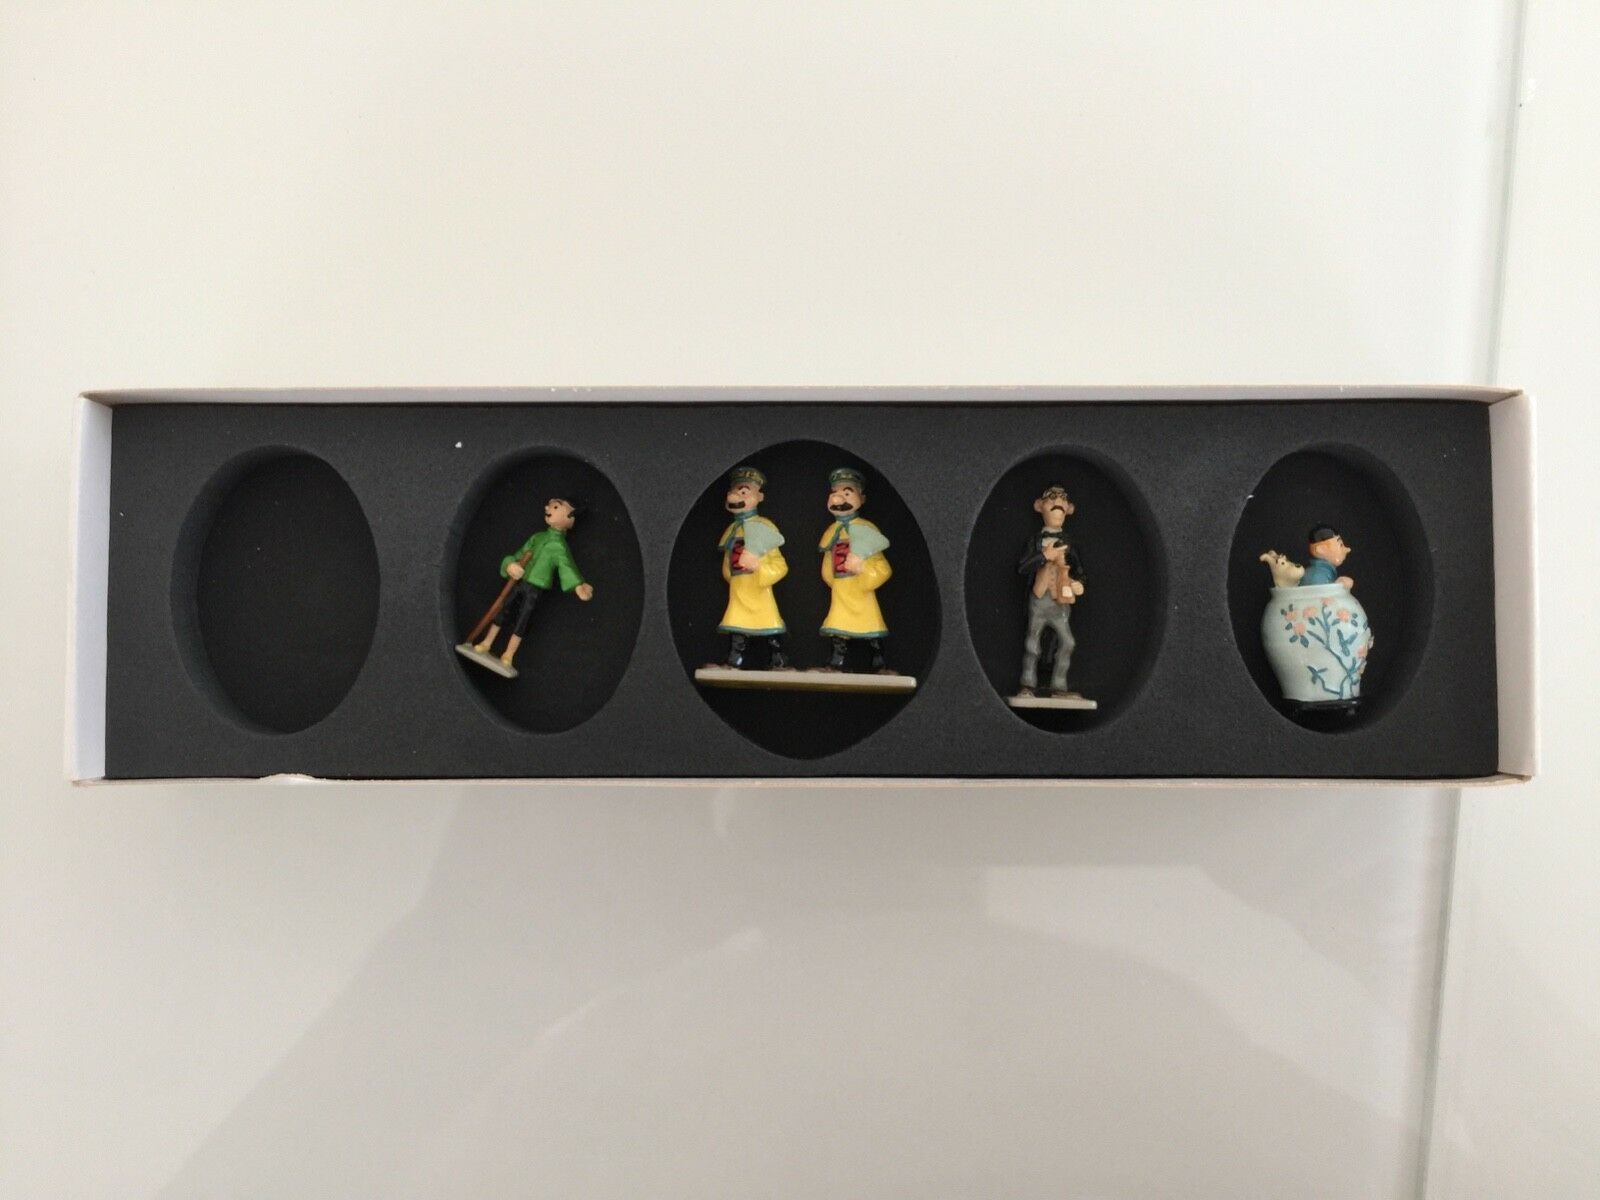 Pixi tintin mini -   le lotus bleu  - 6 figures-rare pieces  prix bas 40%